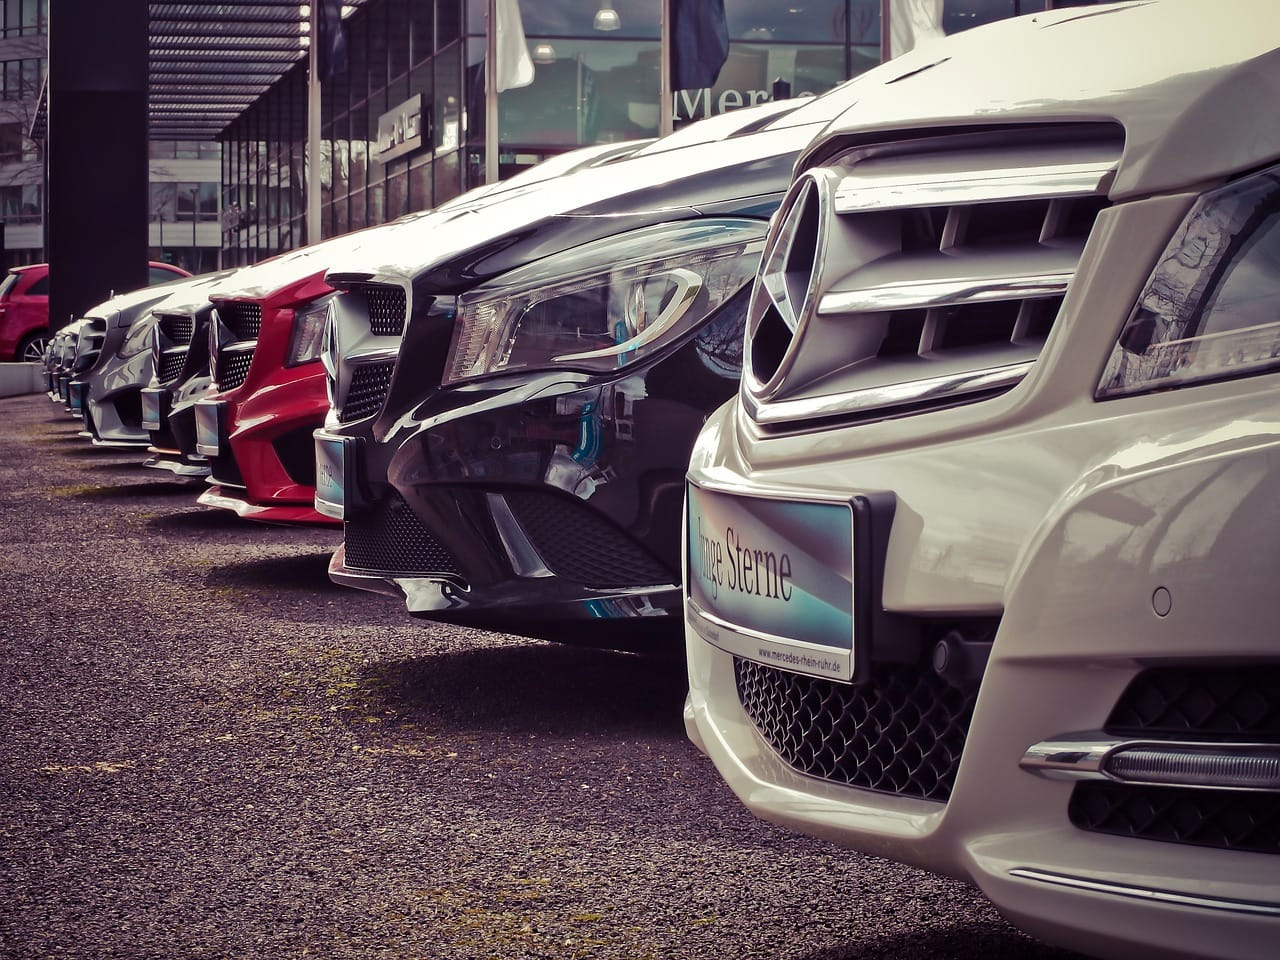 Several Mercedes models